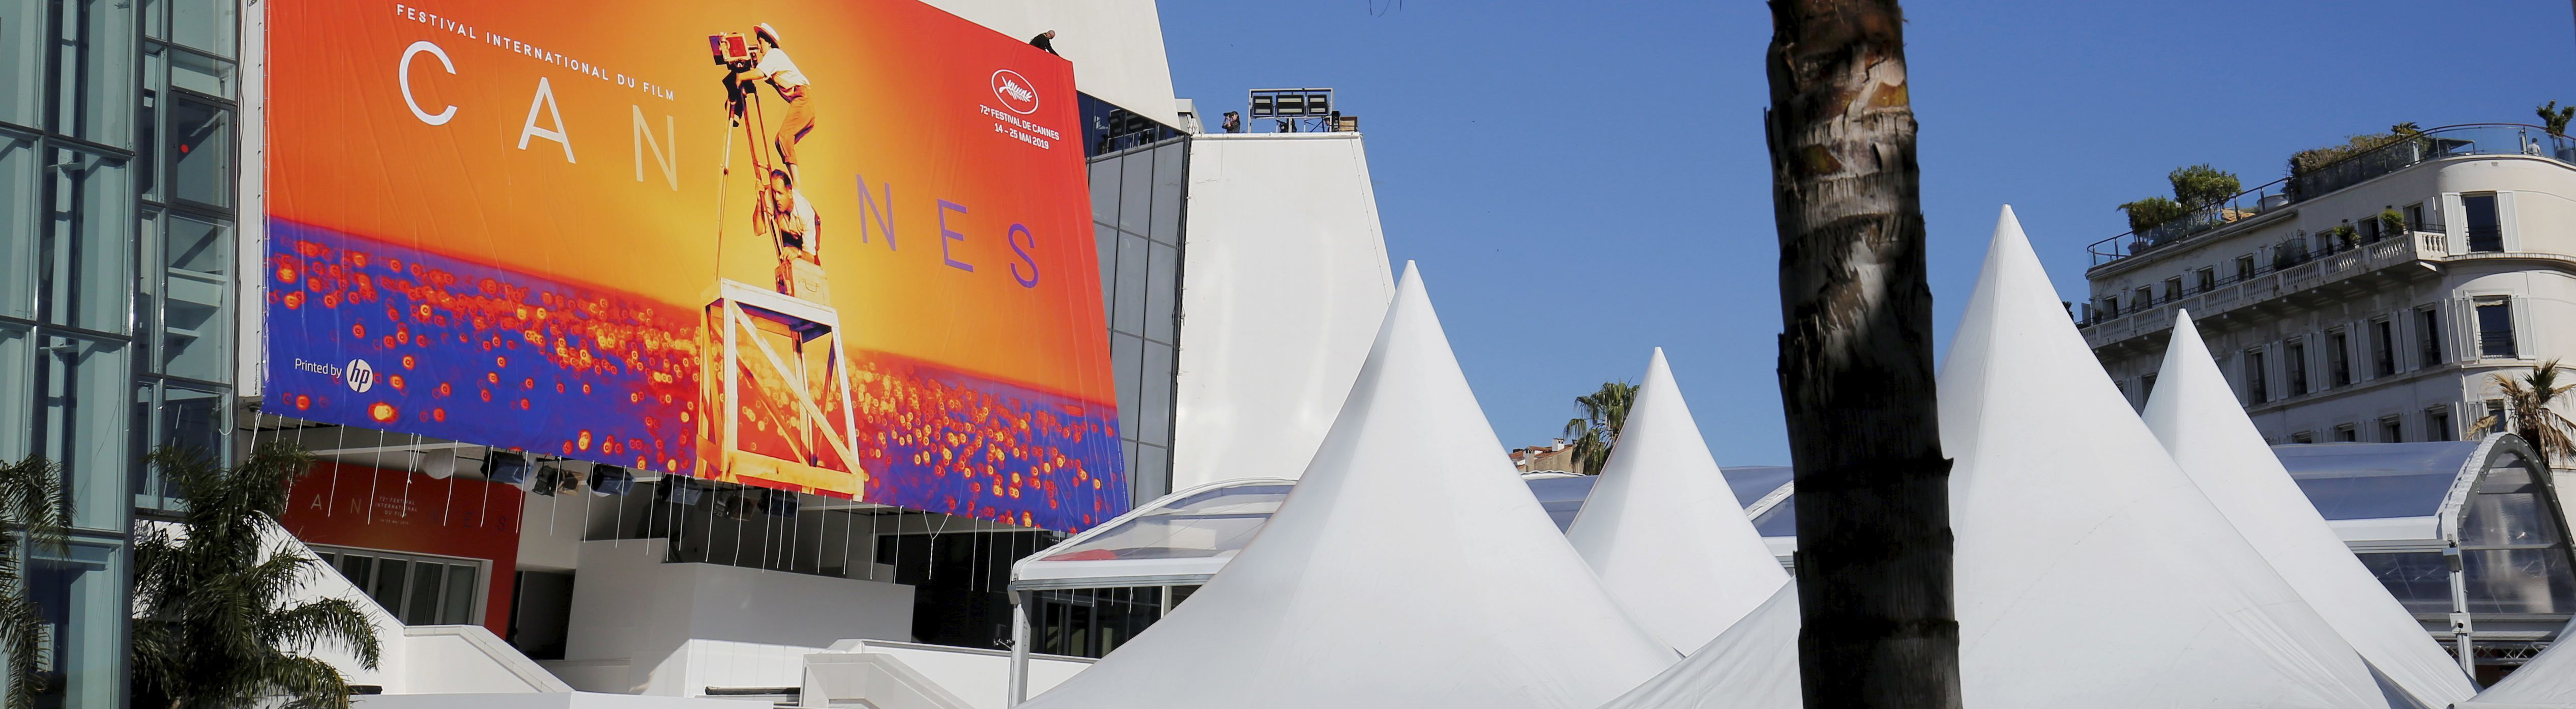 72. internationales Filmestival in Cannes